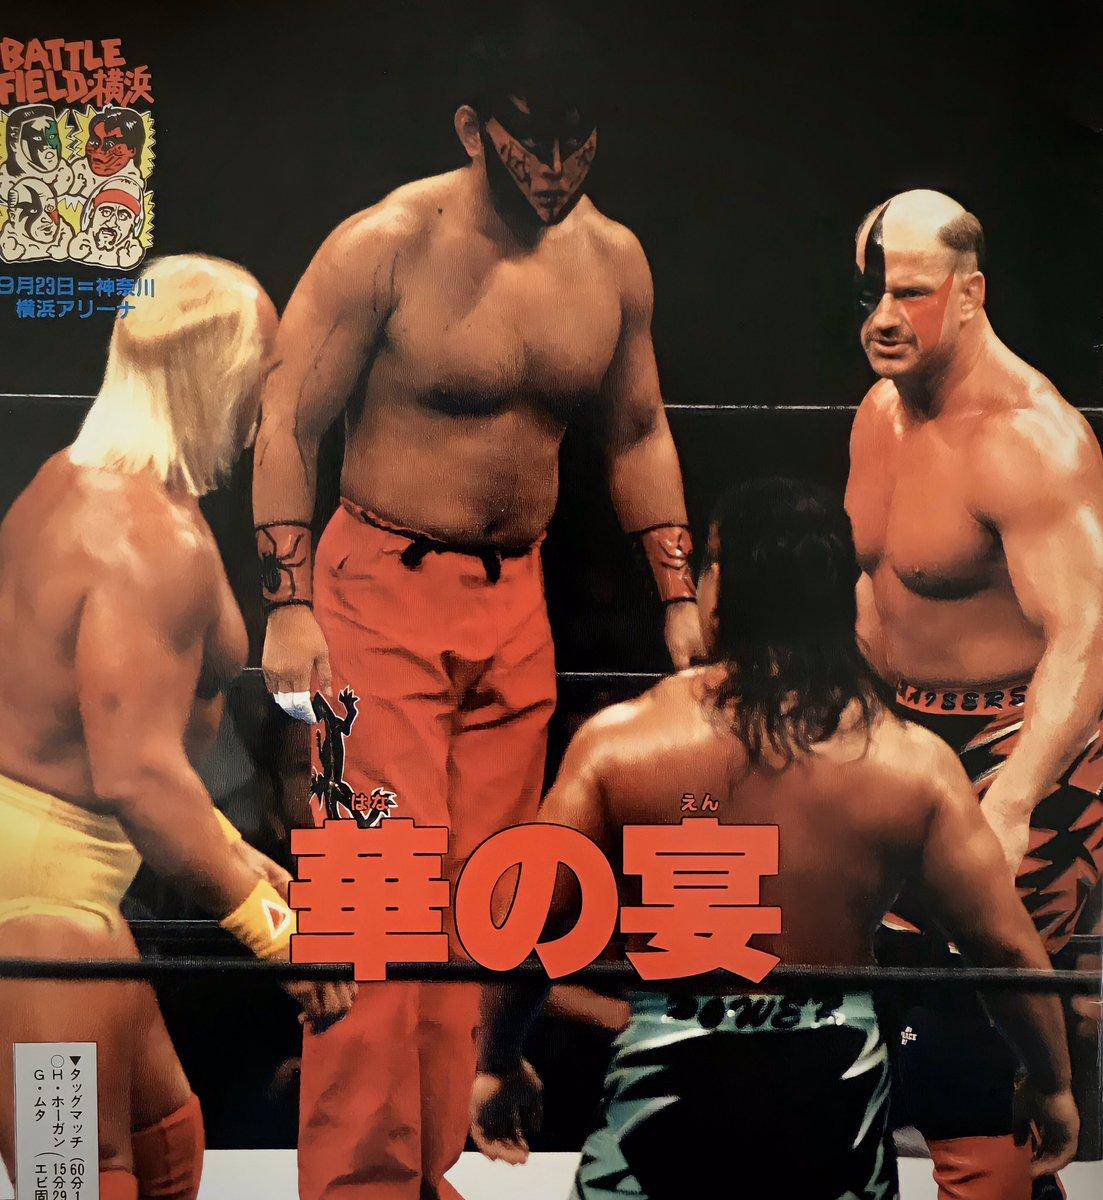 "Vintage Puroresu プロレス on Twitter: ""A massive standoff between Hulk Hogan & The Great Muta and the Hell Raisers Hawk & Power Warrior. #NJPW Battlefield (9.23.93) @HulkHogan @muto_keiji #hulkhogan #thegreatmuta #roadwarriors #ザ・ロード・ウォリアーズ #"